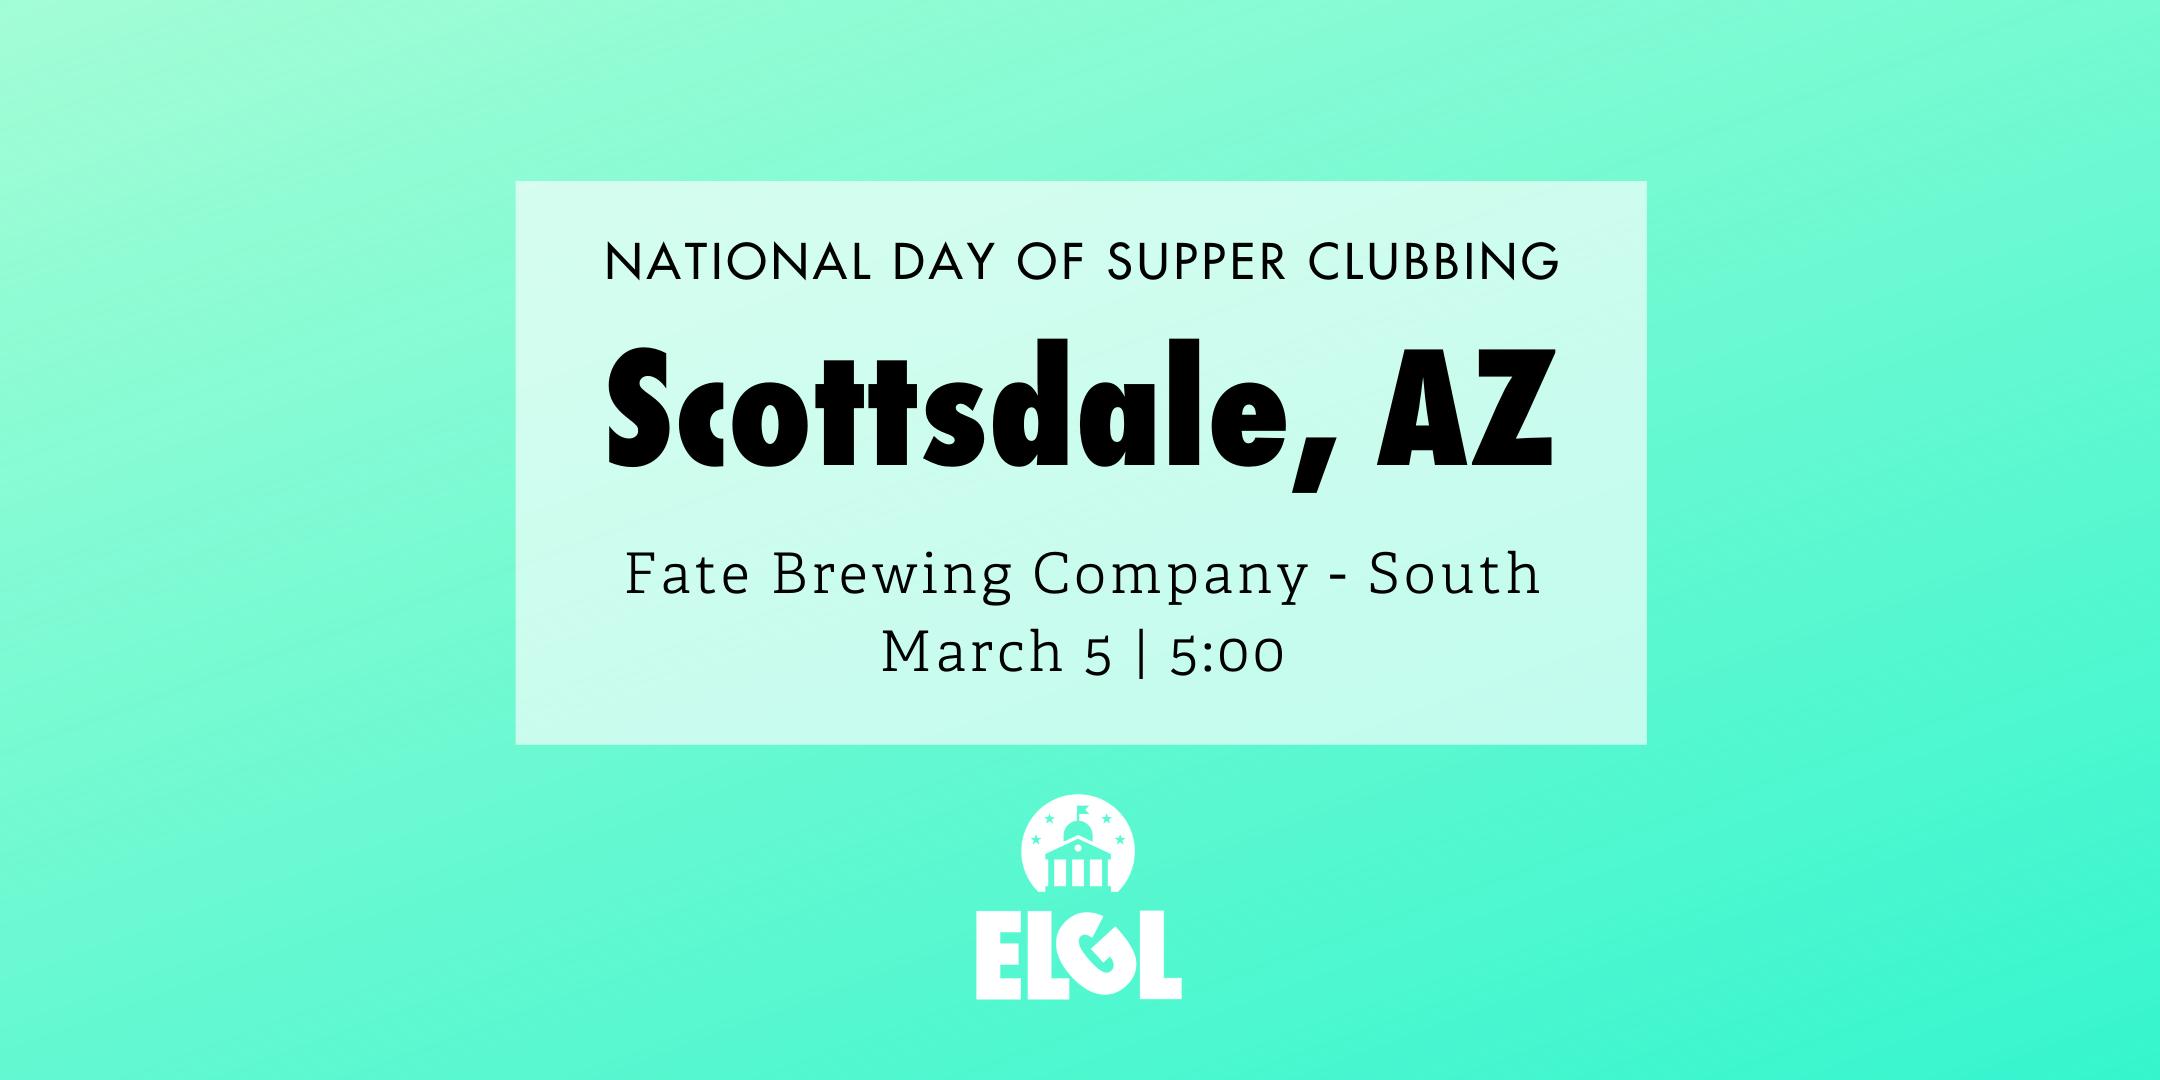 #NDOSC Scottsdale AZ